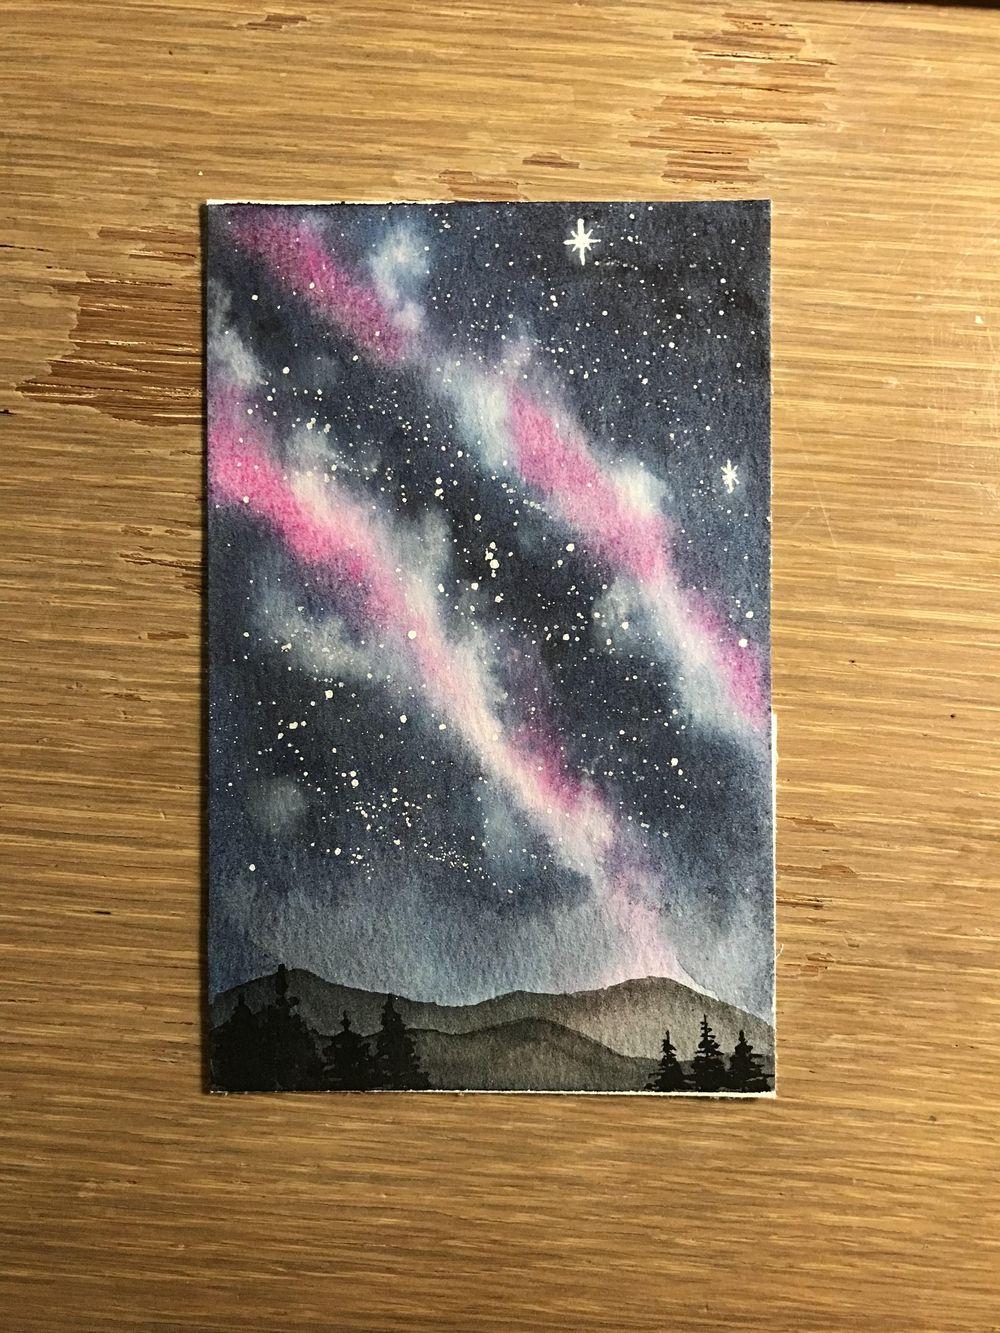 Nebula - image 3 - student project